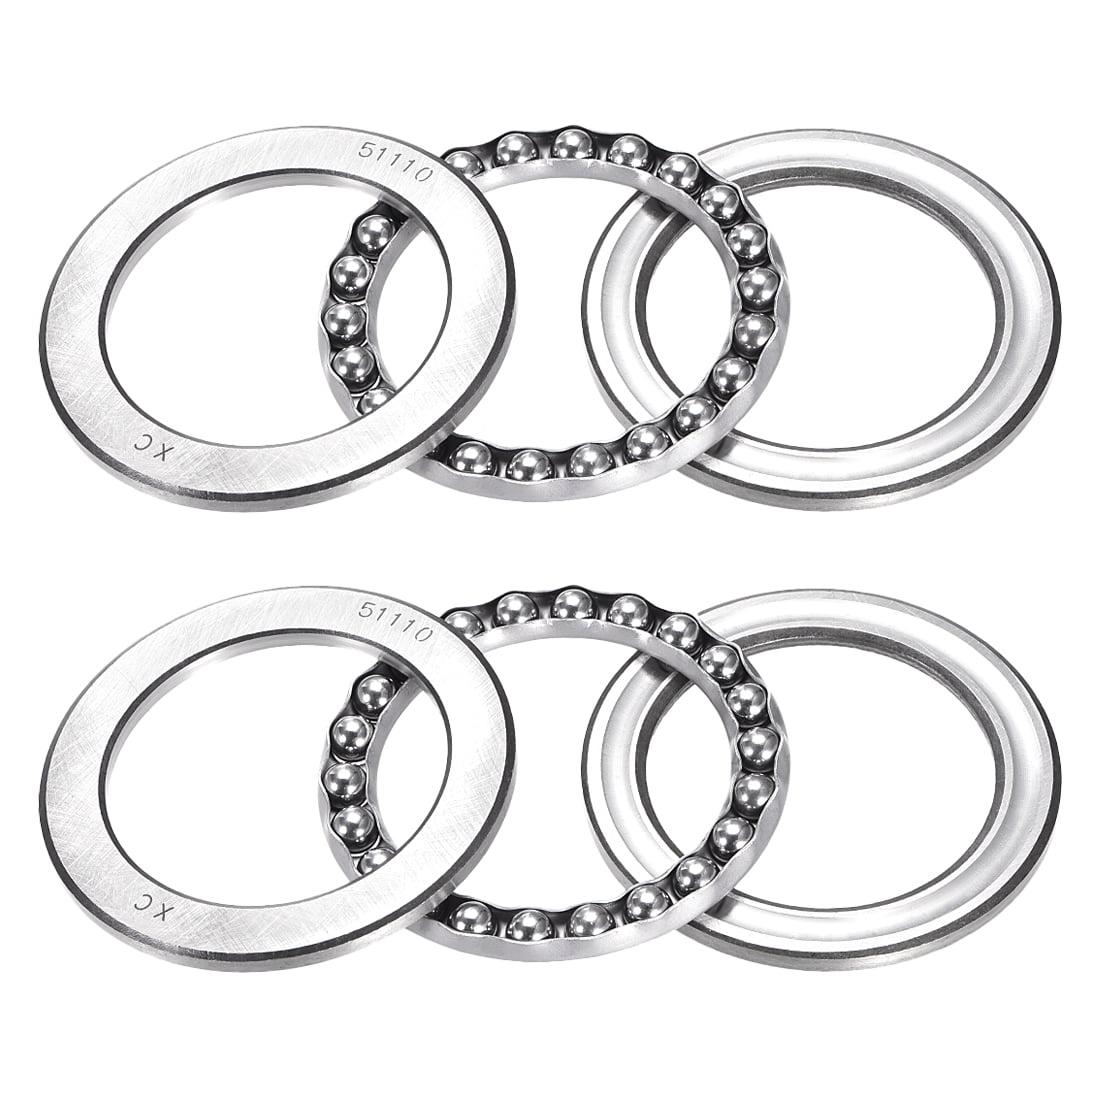 uxcell 51110 Single Direction Thrust Ball Bearings 50mm x 70mm x 14mm Chrome Steel